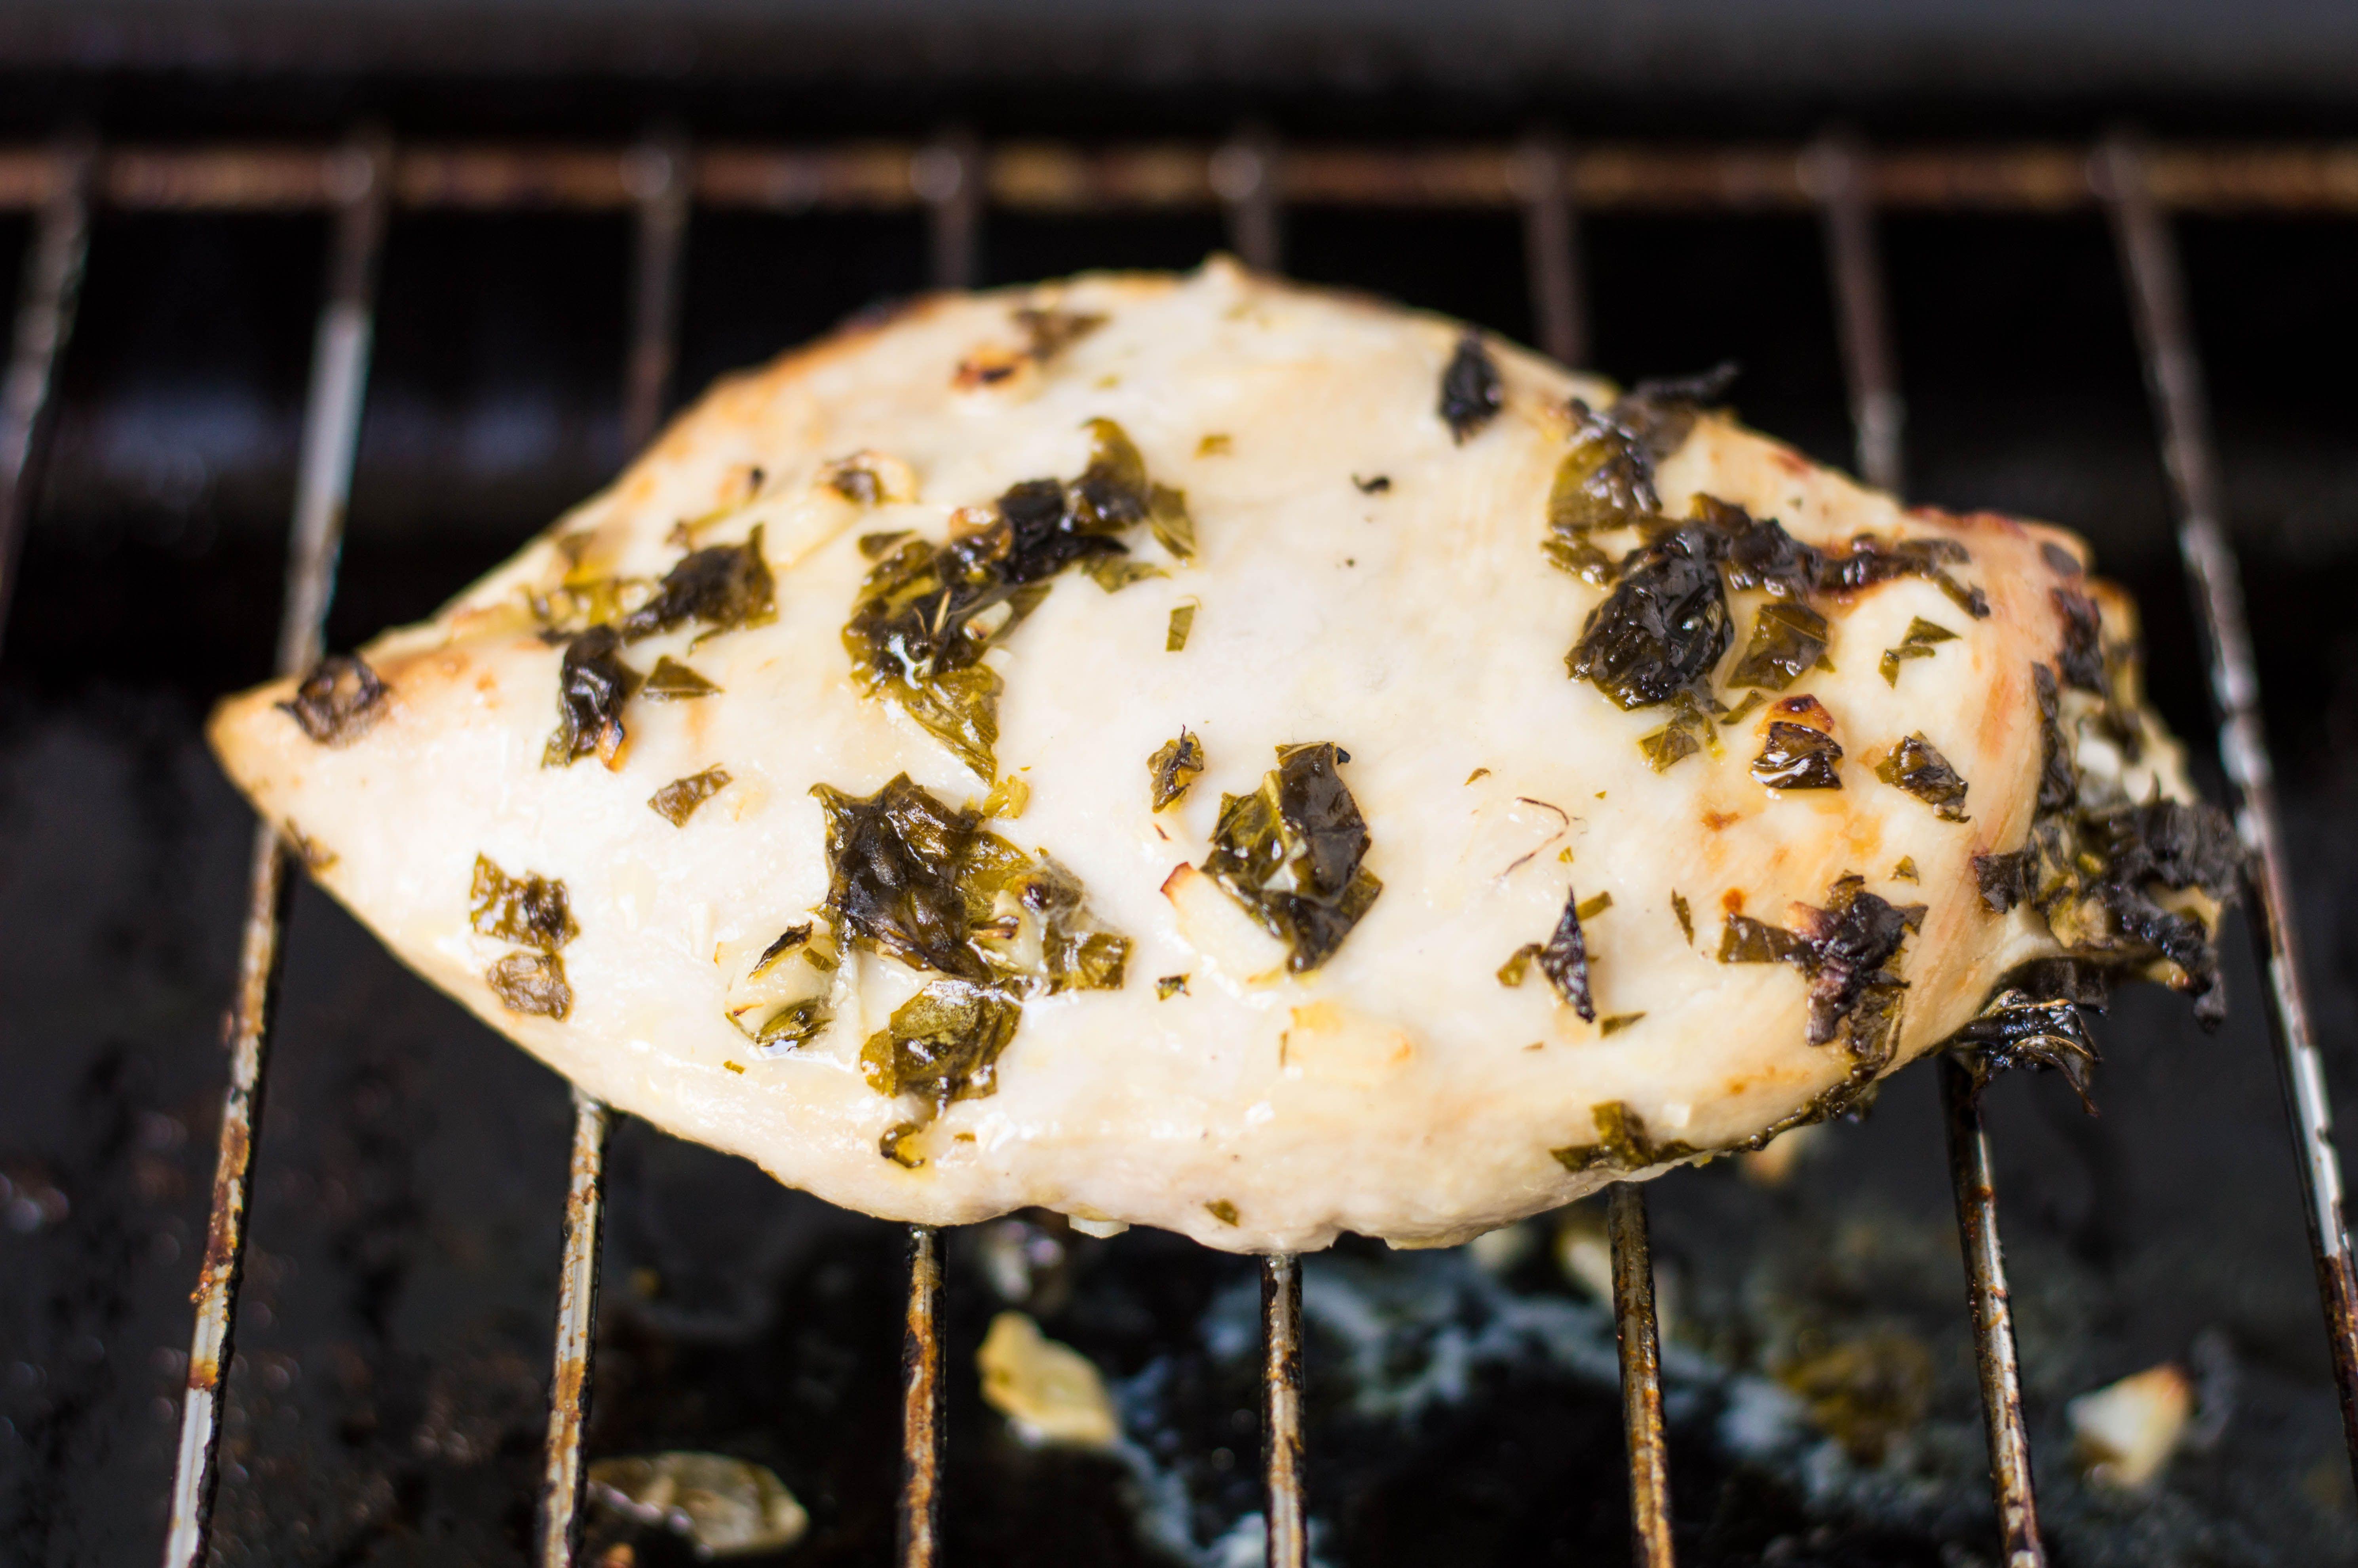 Grilled lemon basil chicken.